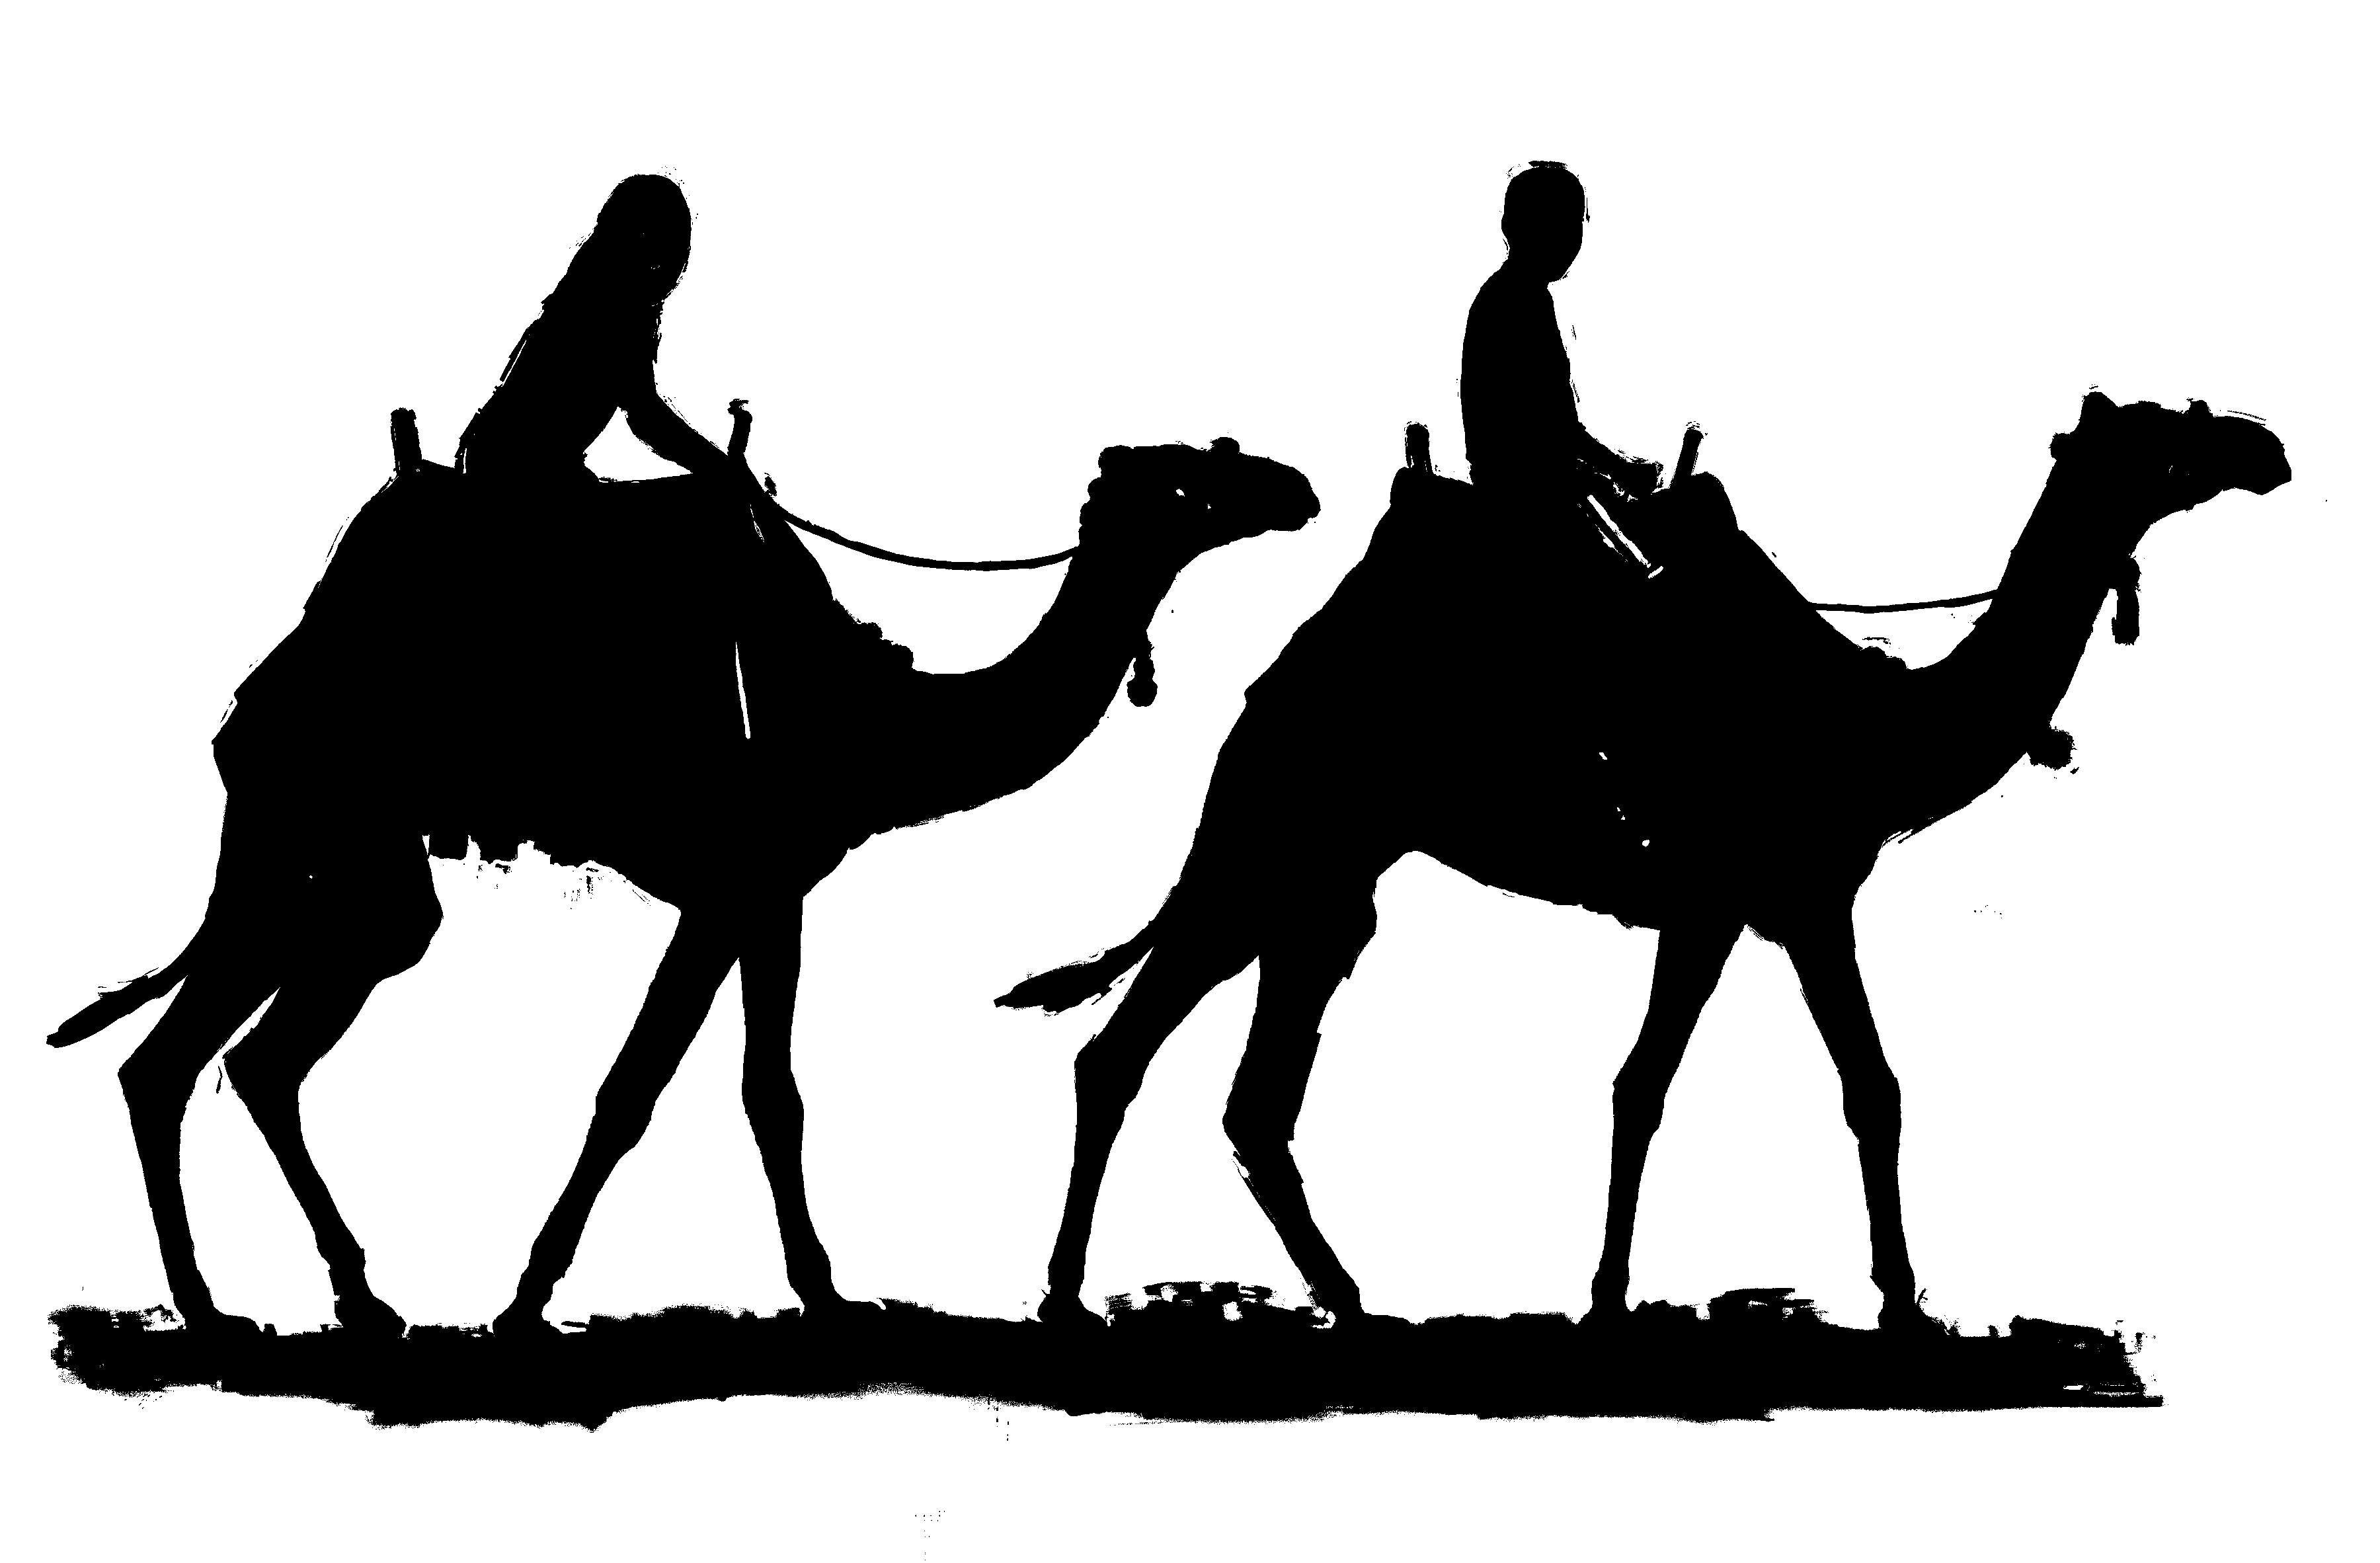 Camel clipart journey, Camel journey Transparent FREE for.